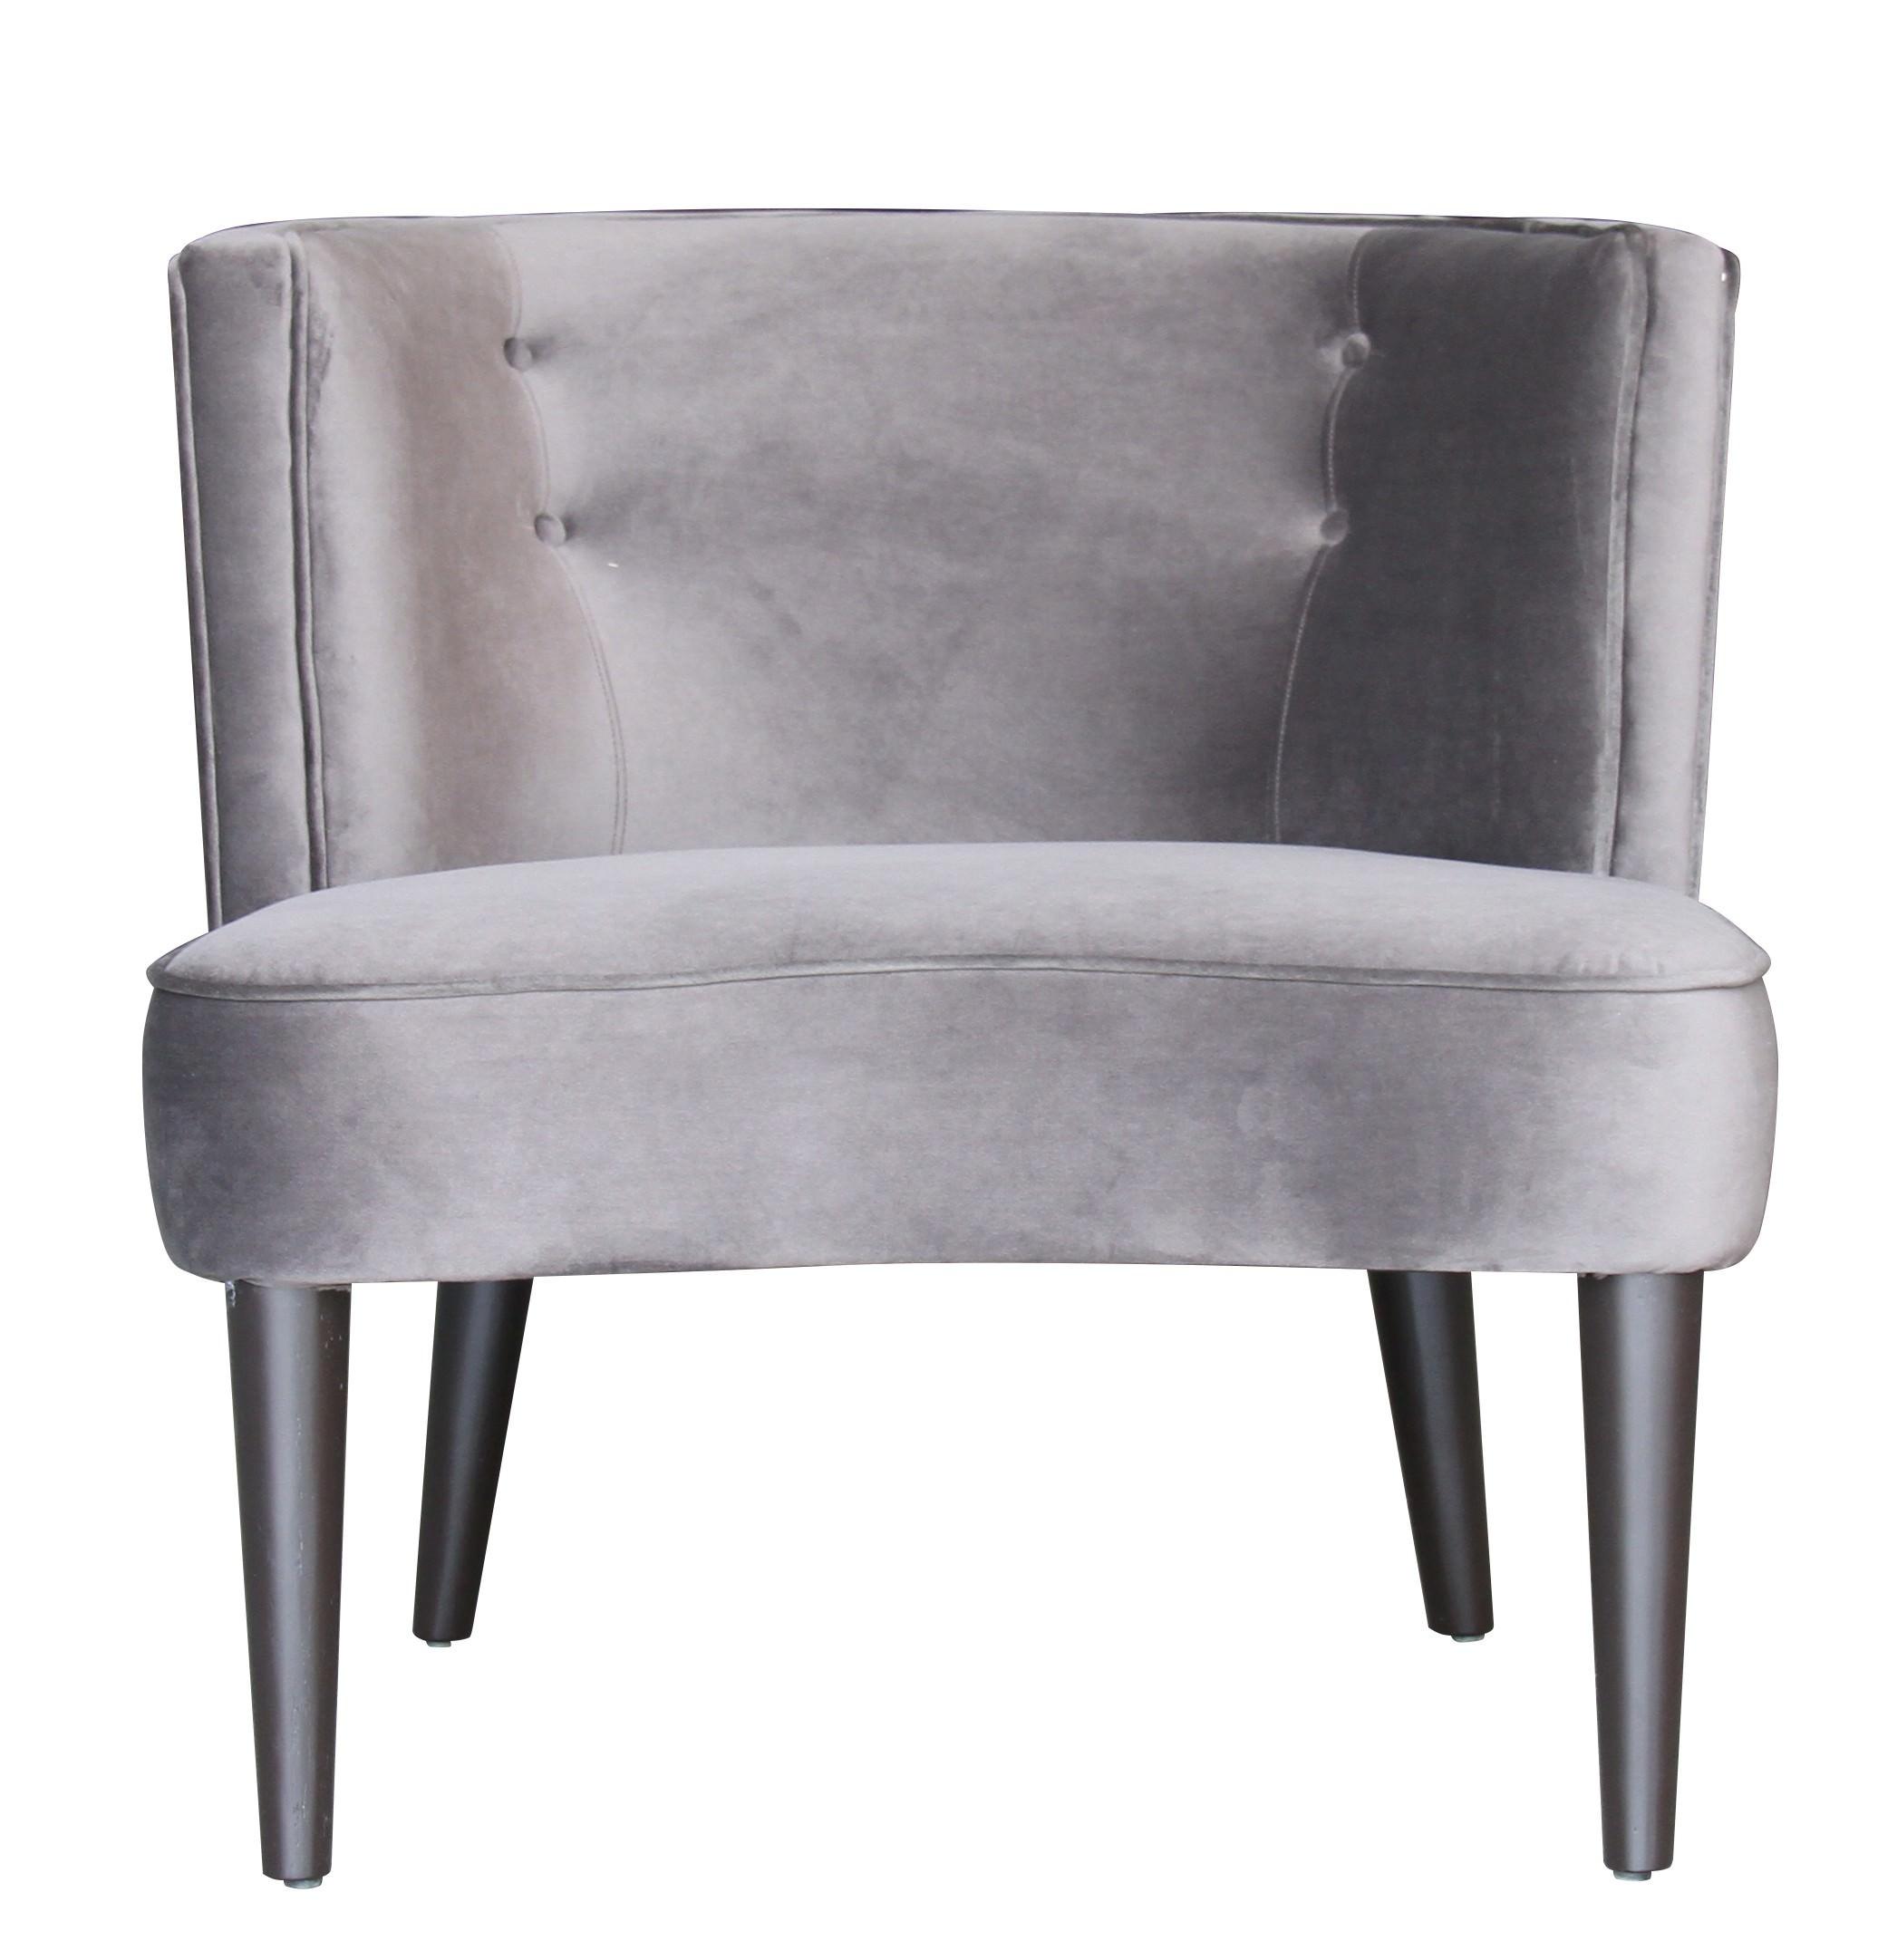 Magellan Velvet Fabric Lounge Chair, Dark Grey